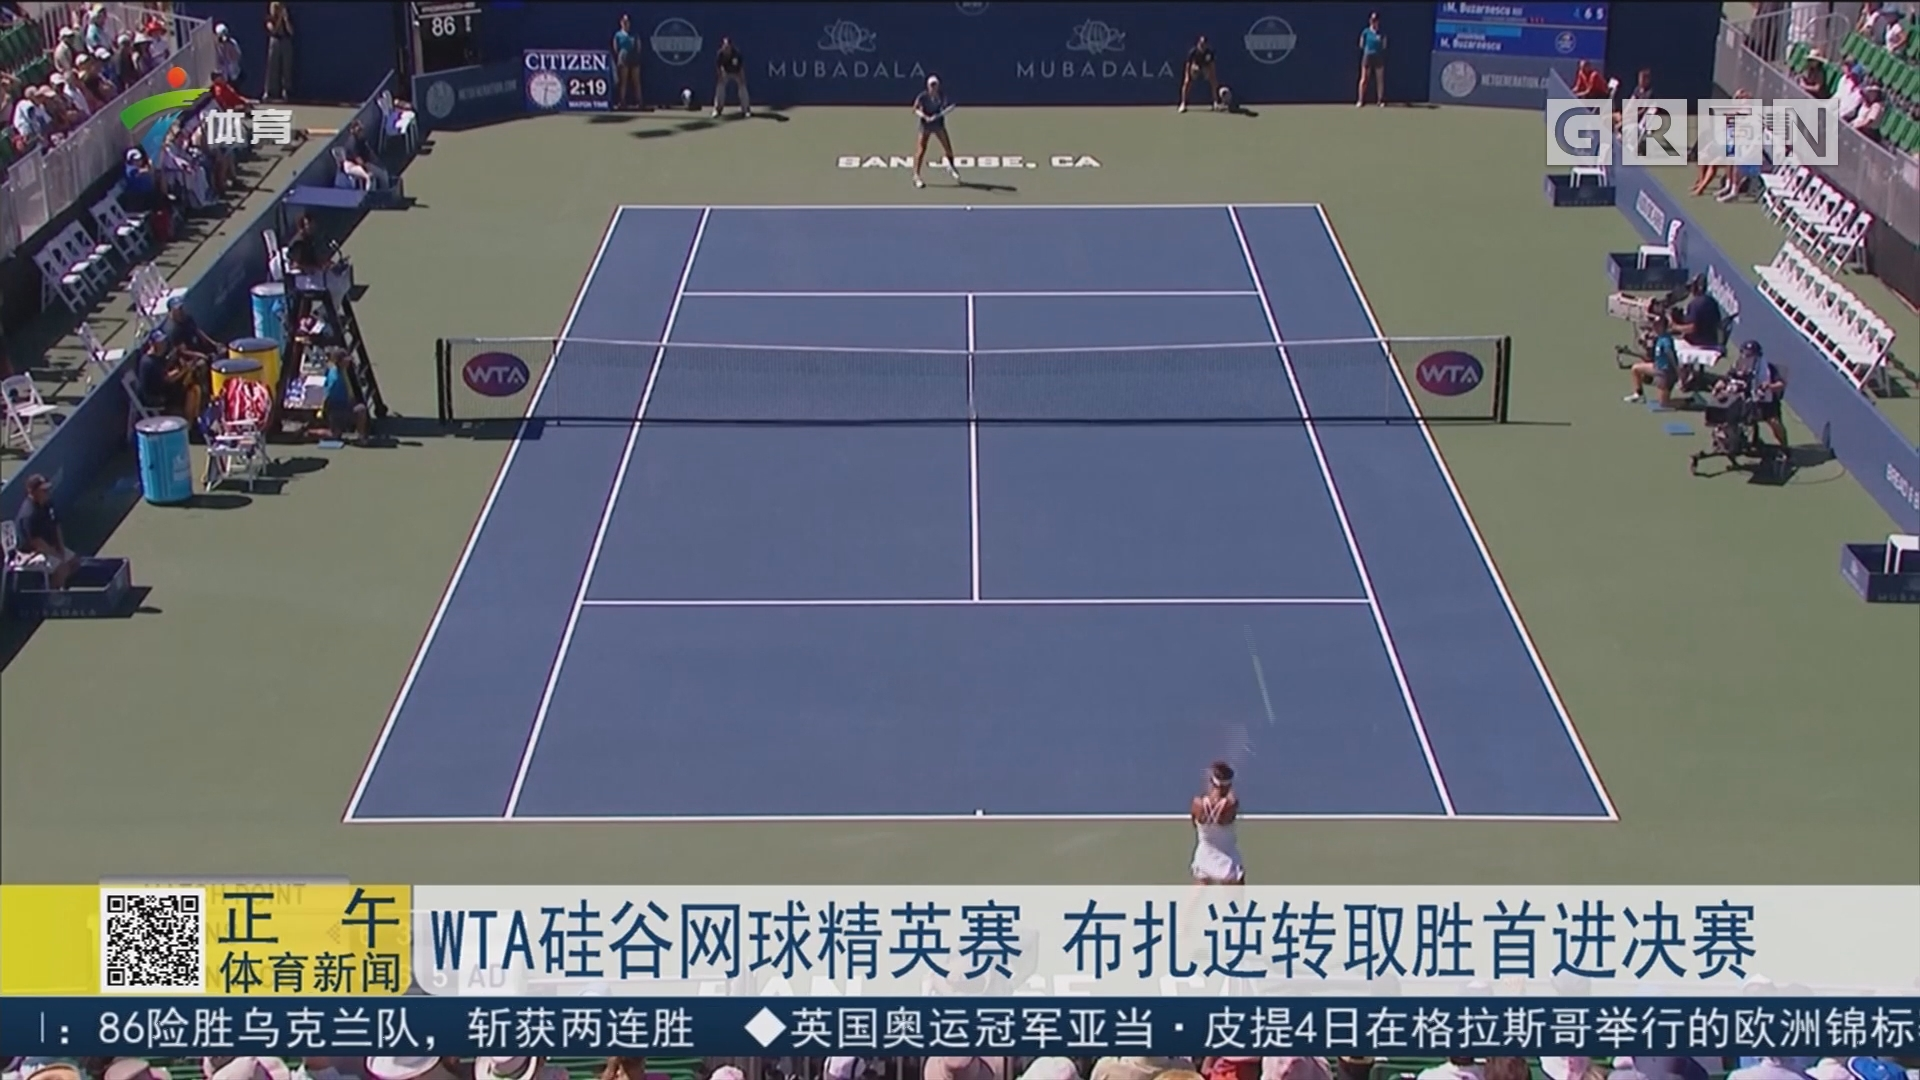 WTA硅谷网球精英赛 布扎逆转取胜首进决赛